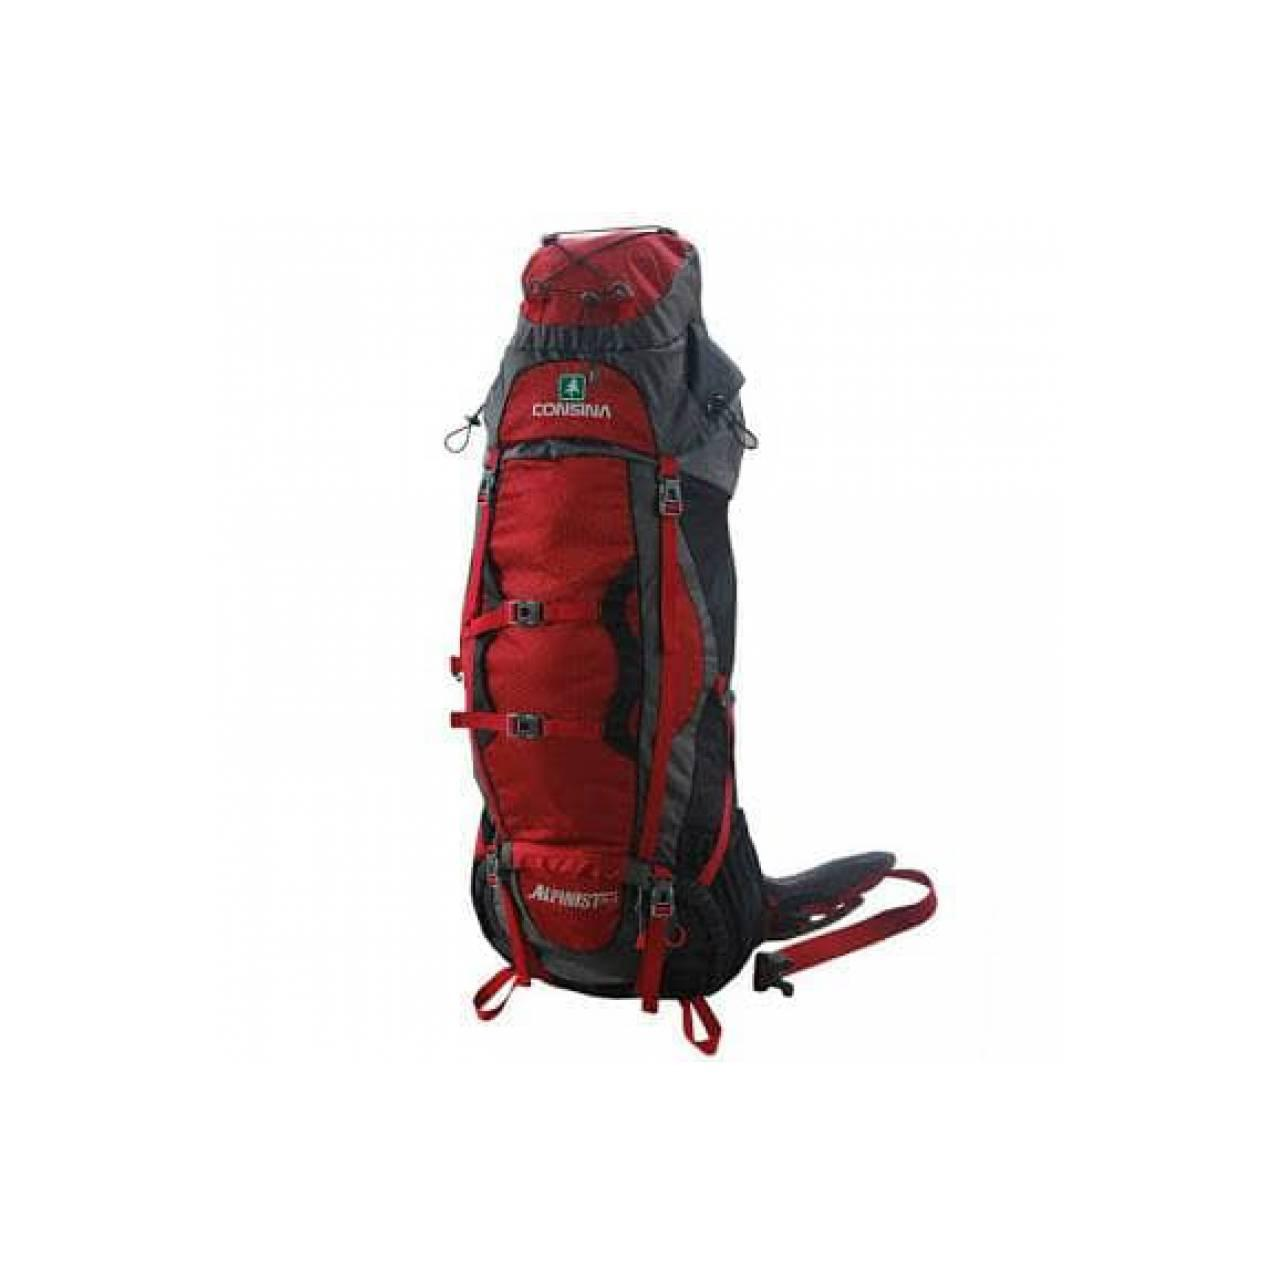 keril consina alpinest alpinist merah termurah bukan rei eiger avtech